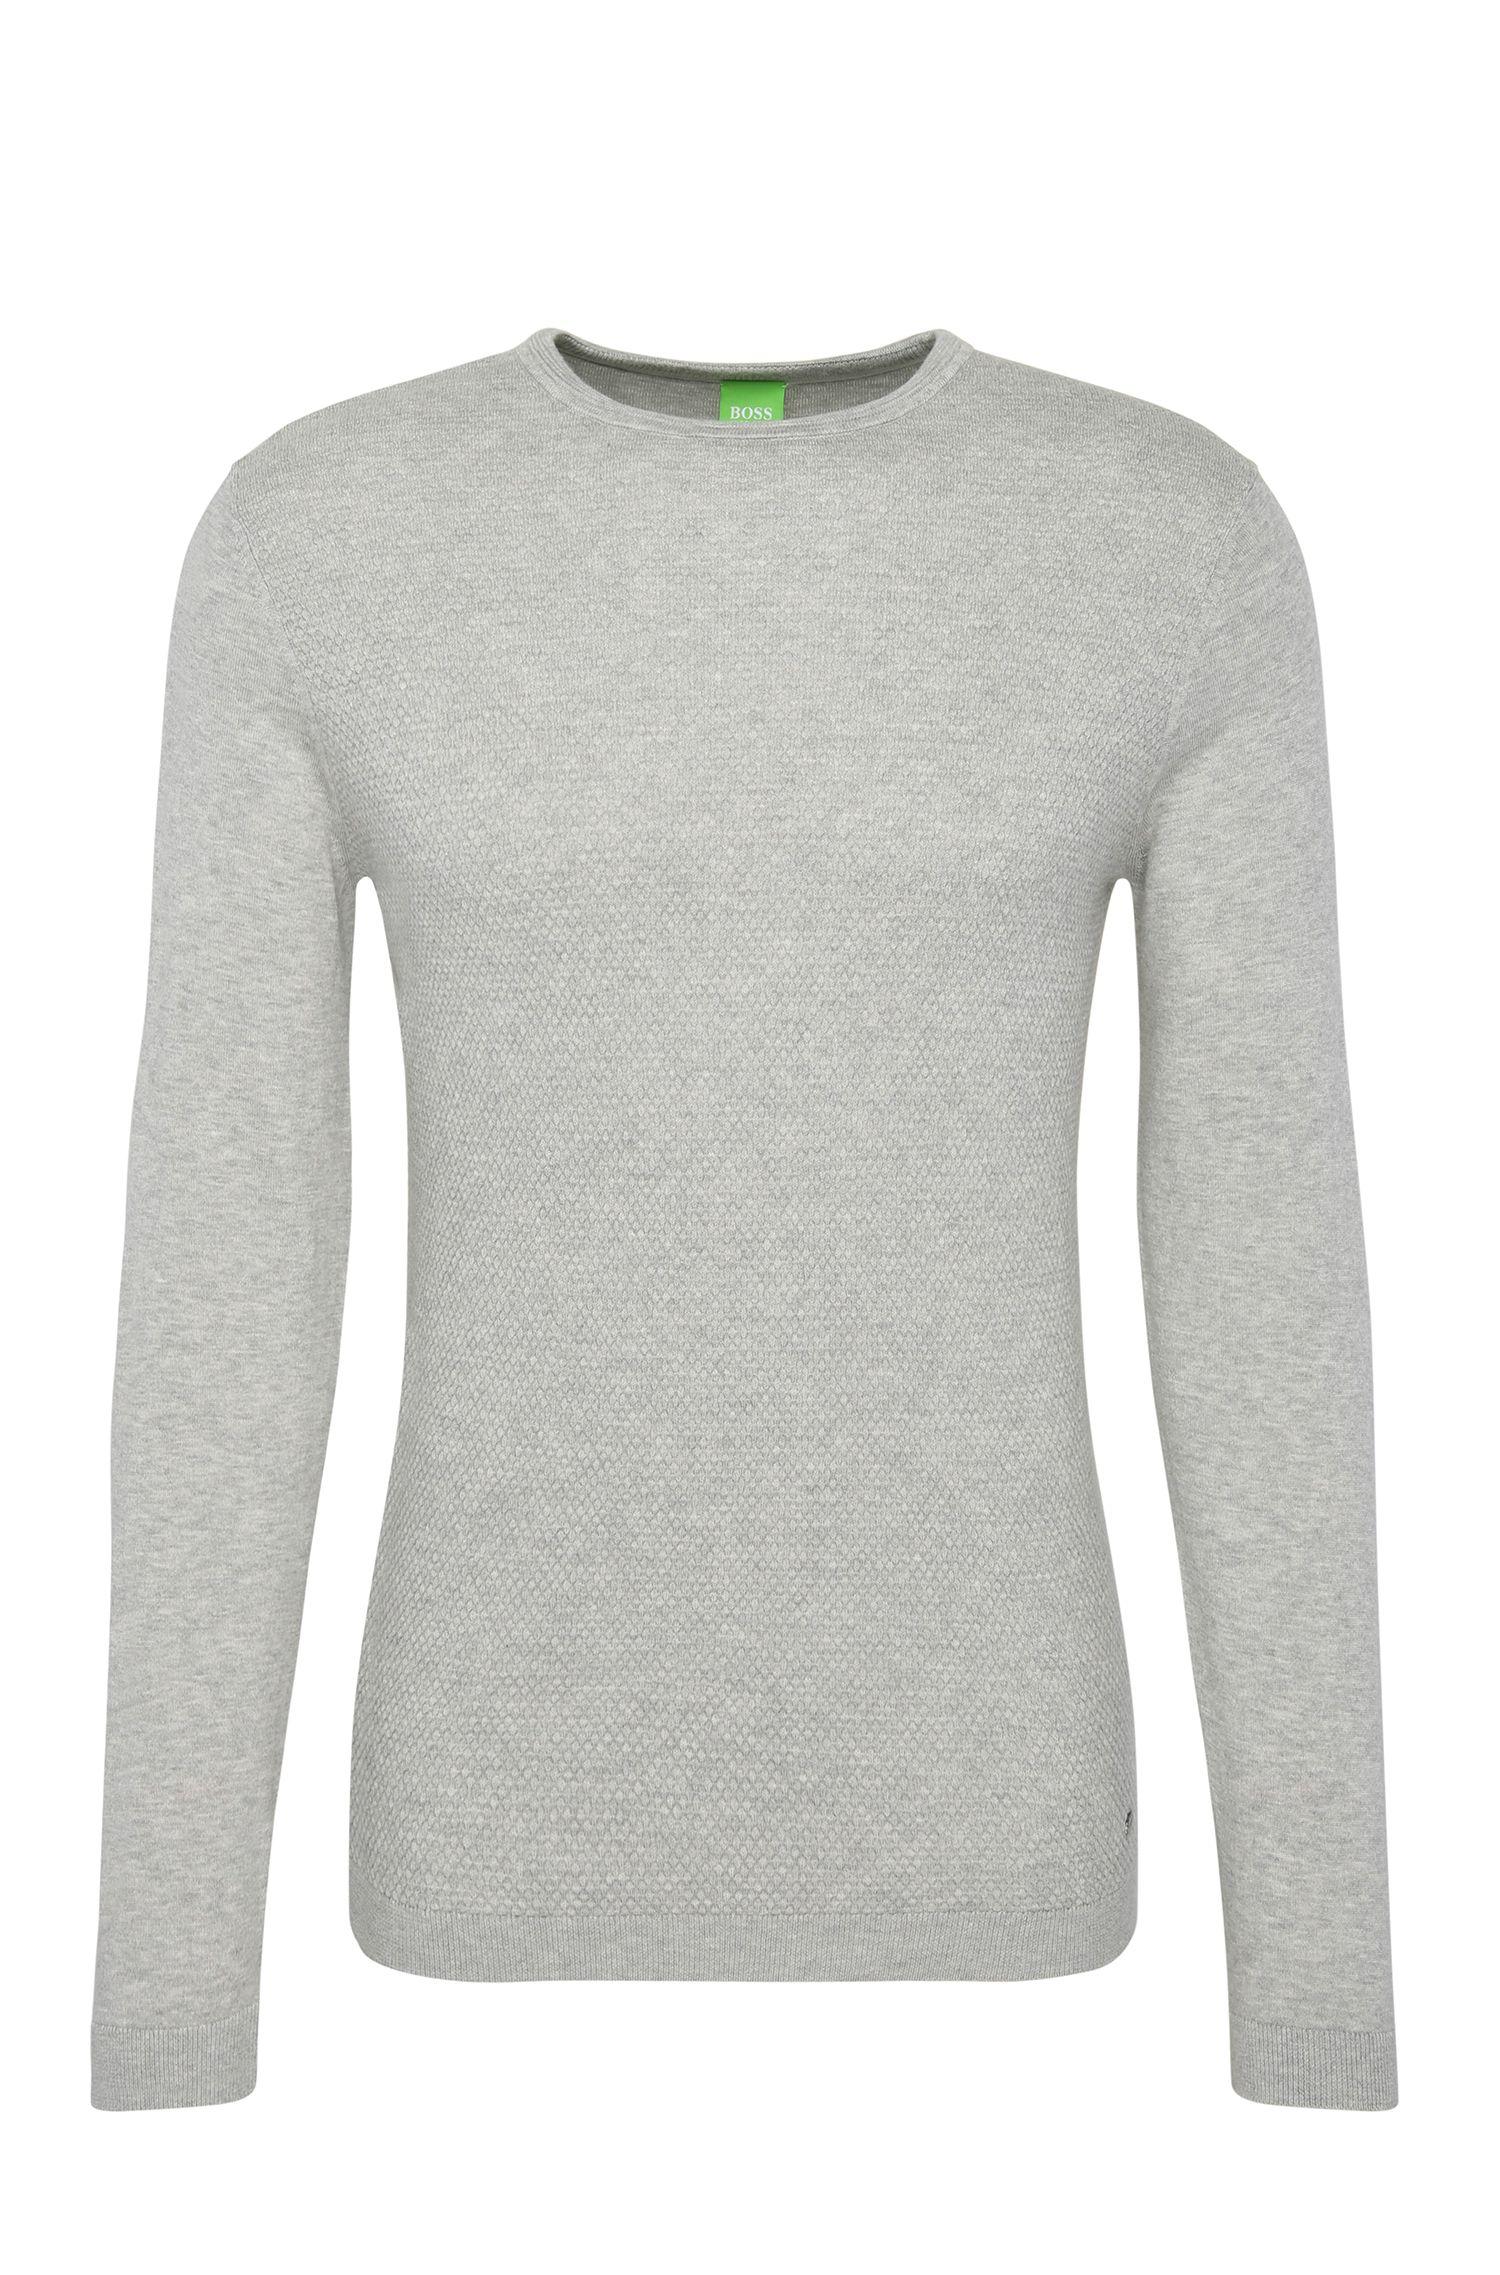 Gebreide regular-fit trui van katoen met wol: 'Ritt'